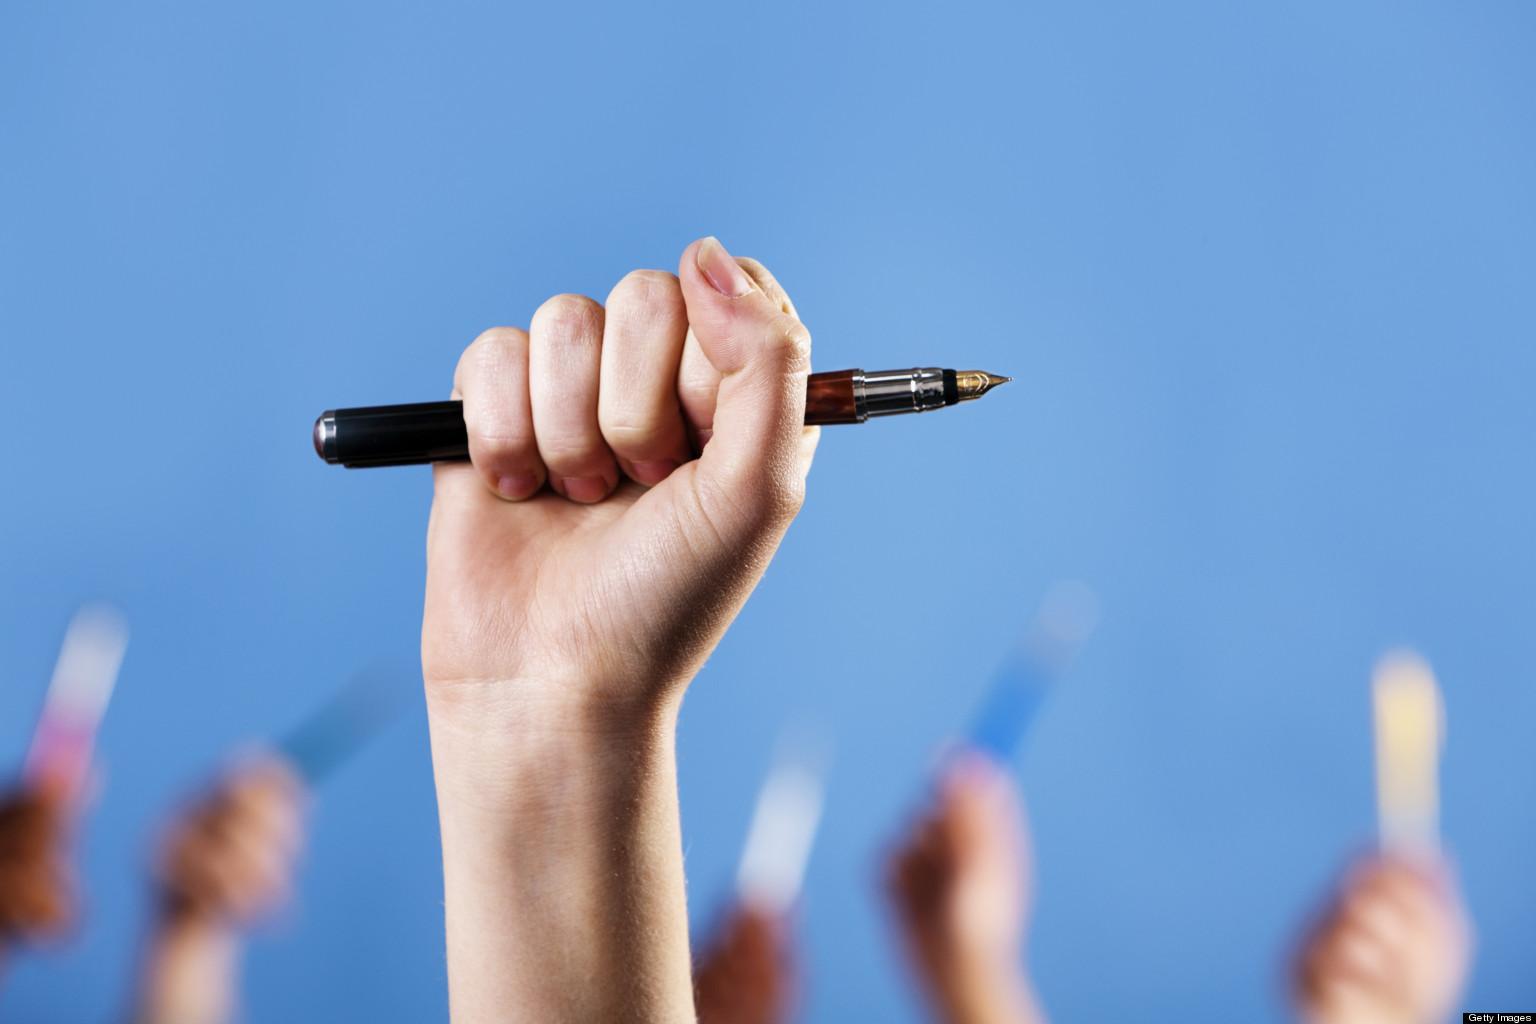 Success-Mantra-to-Clear-Entrance-Exam Амжилт хэнд ирдэг вэ?